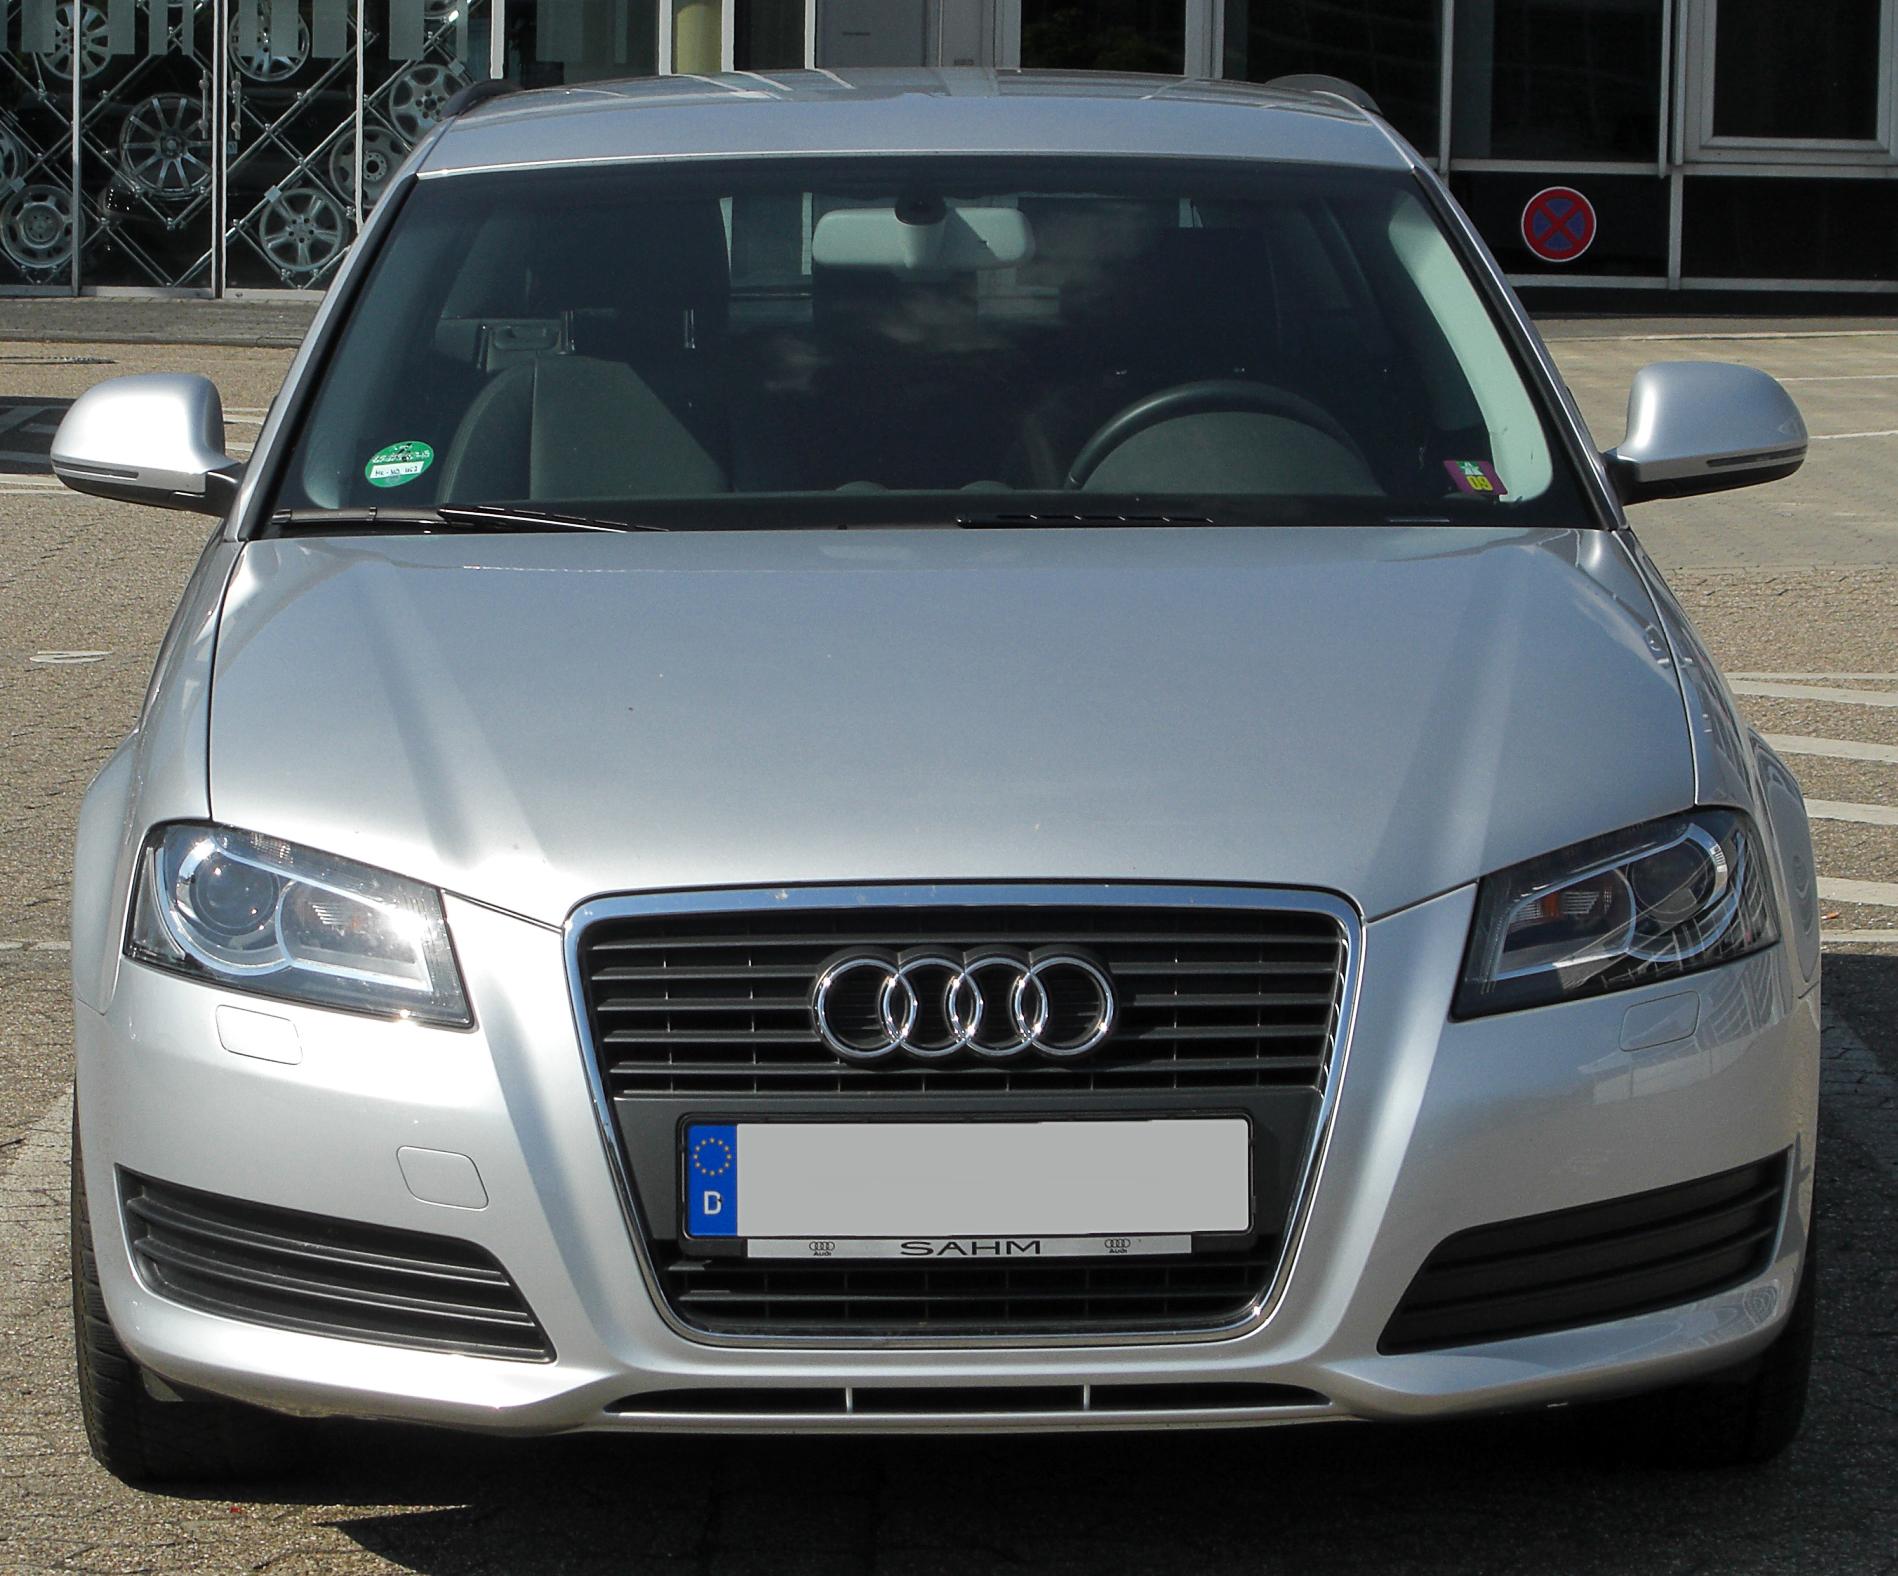 Audi A 3 2010 >> File:Audi A3 1.4 T Sportback 8PA II. Facelift front-1 20100718.jpg - Wikimedia Commons